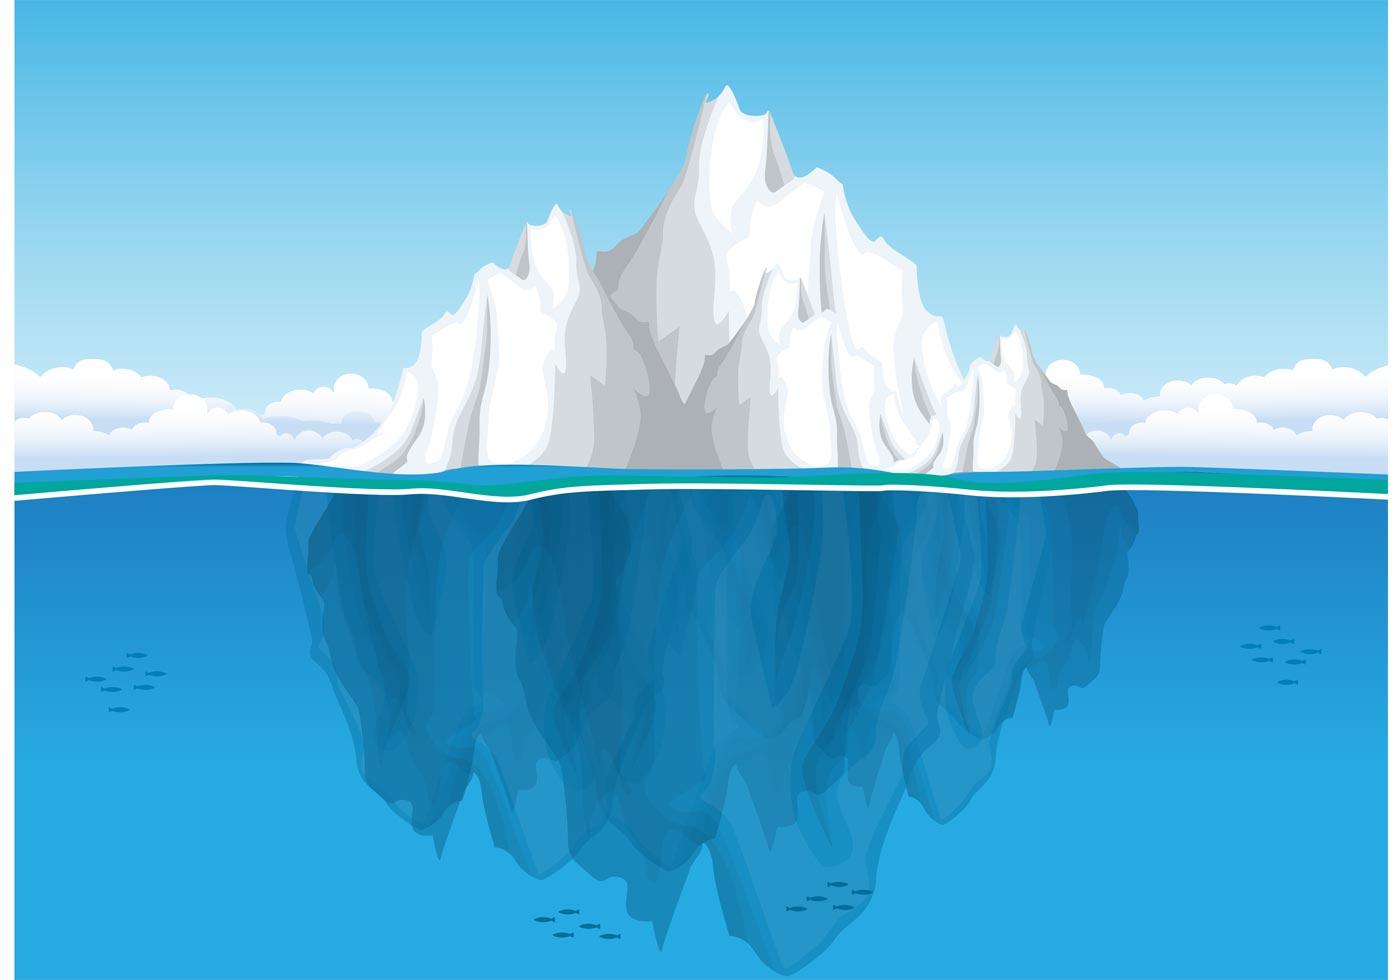 Clip Art Iceberg Clipart iceberg free vector art 1222 downloads underwater vector